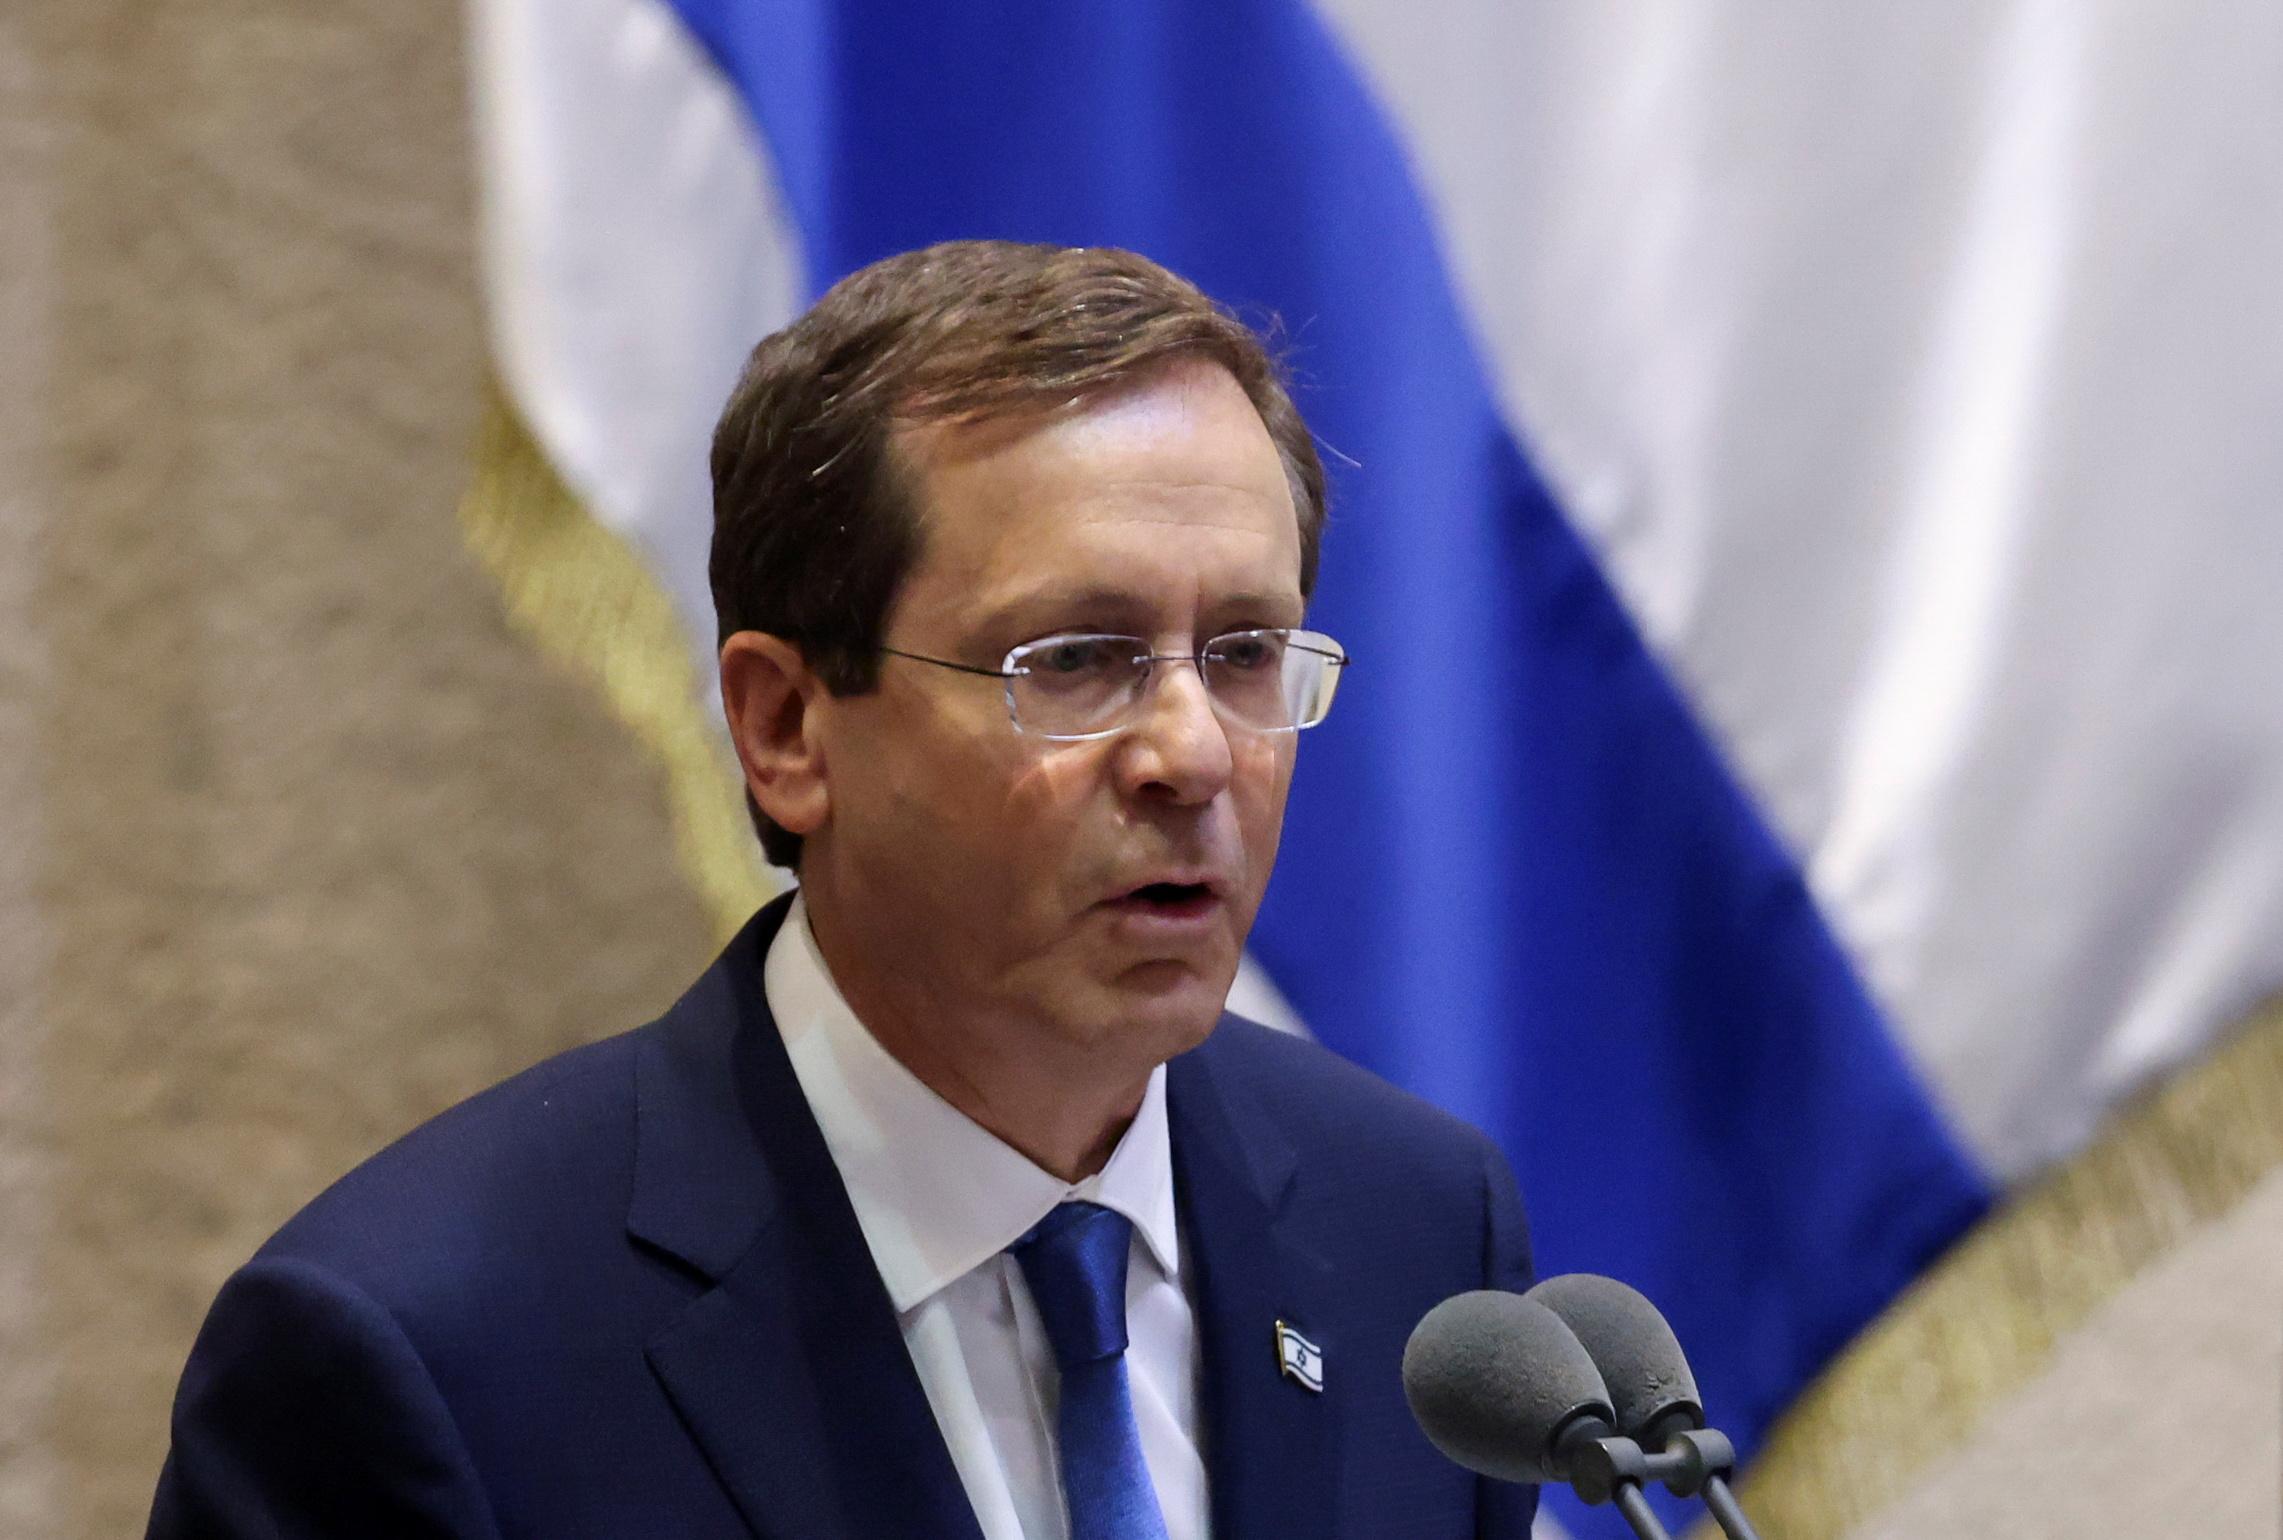 Israeli President Isaac Herzog speaks at the Knesset, Israeli parliament, in Jerusalem July 7, 2021. REUTERS/Ronen Zvulun